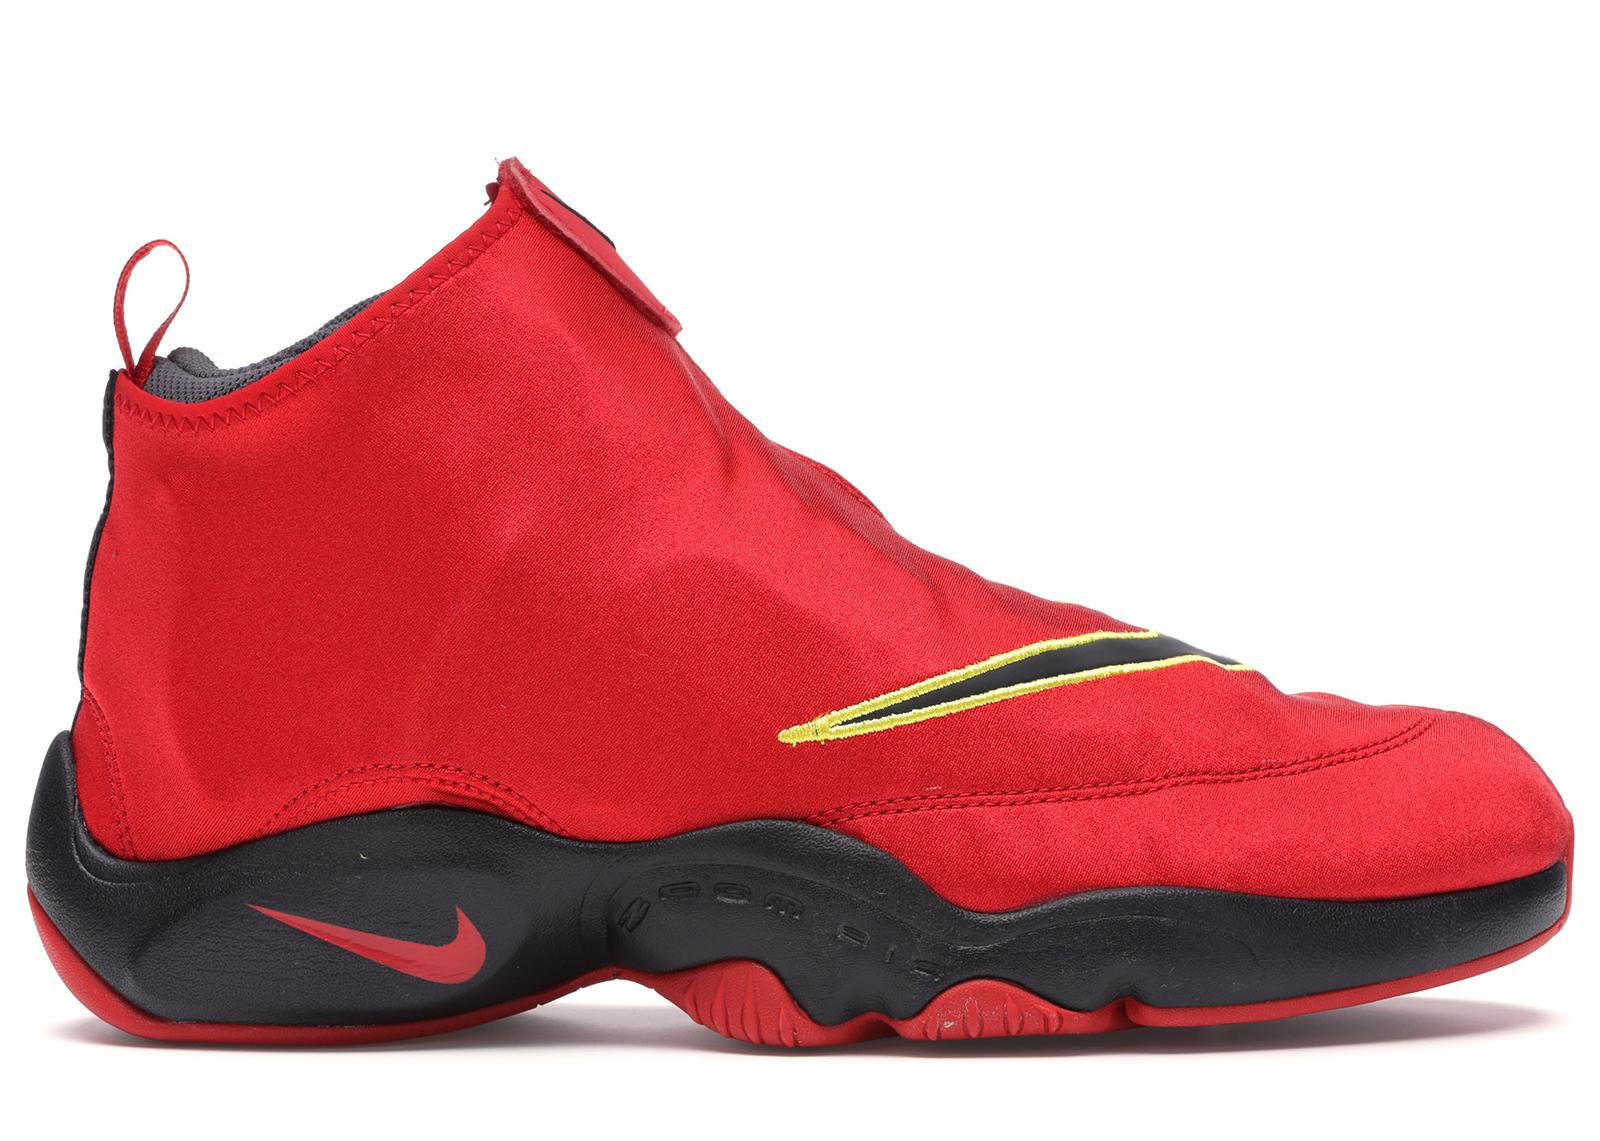 Nike Air Zoom Flight 98 The Glove Miami